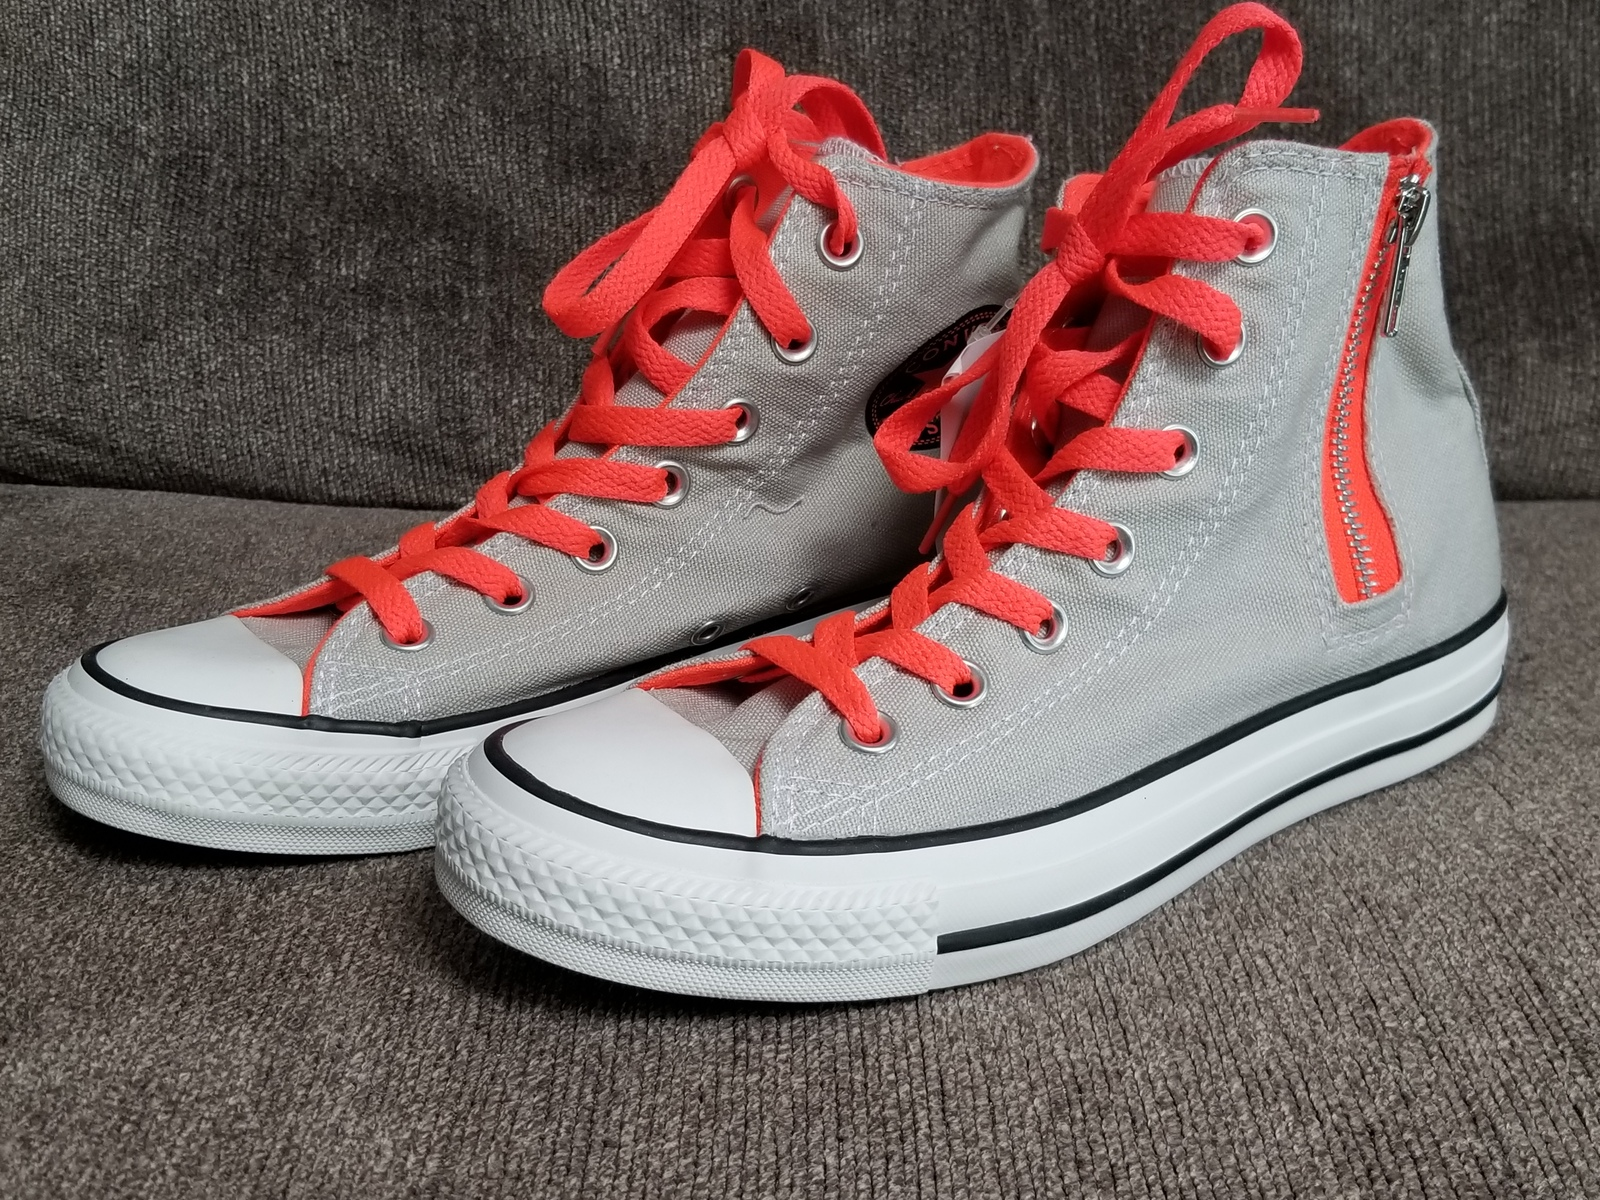 new zealand converse 38 0d104 eeb50